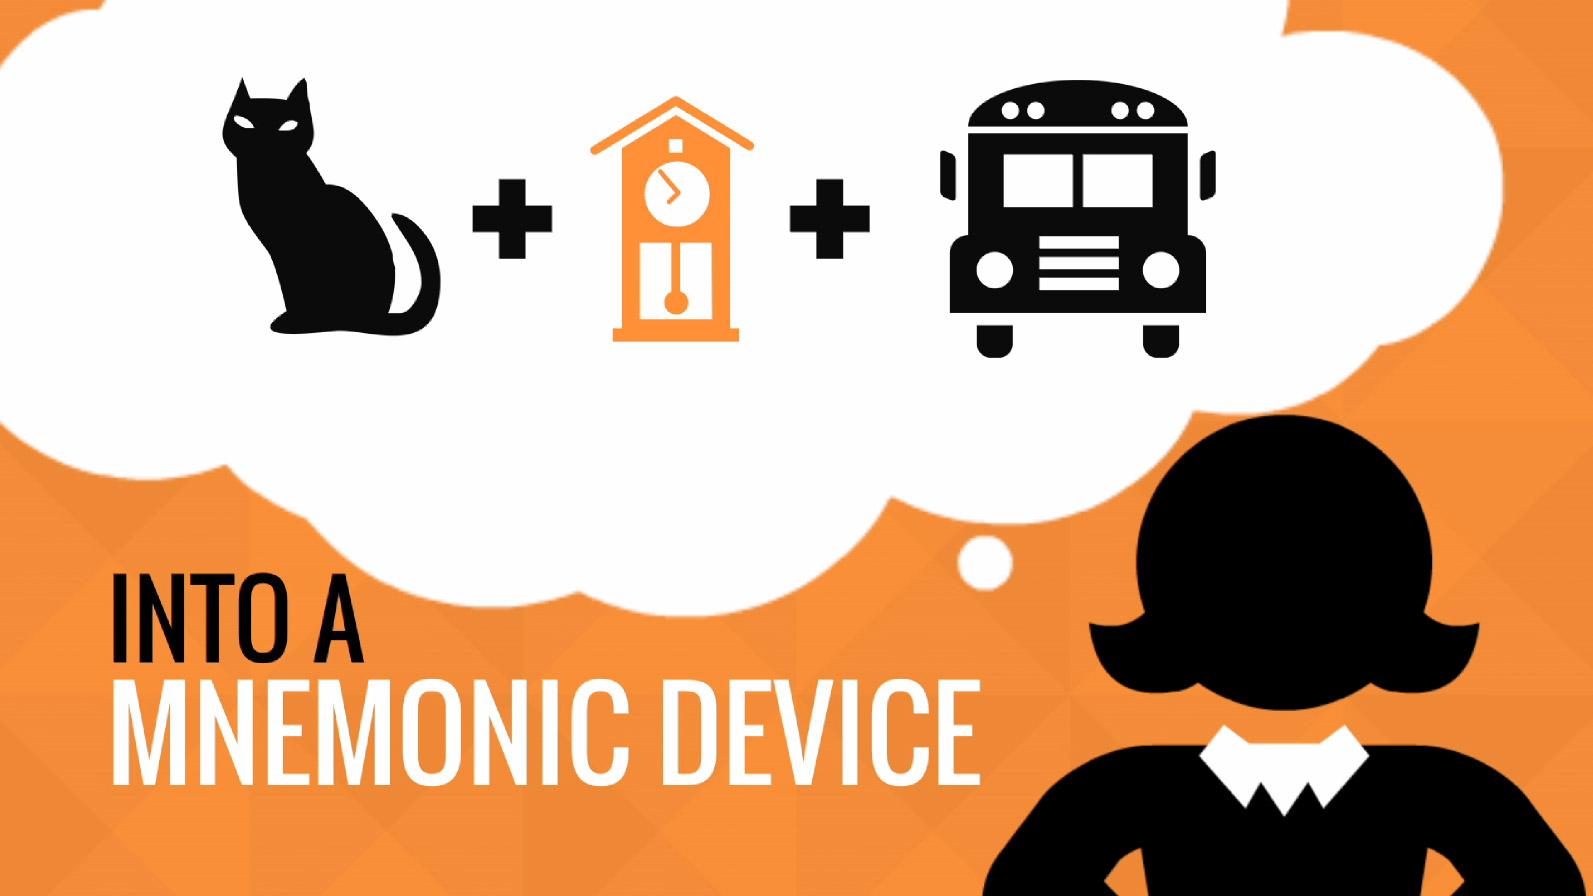 TEACH_Video_5_Mnemonic-devices